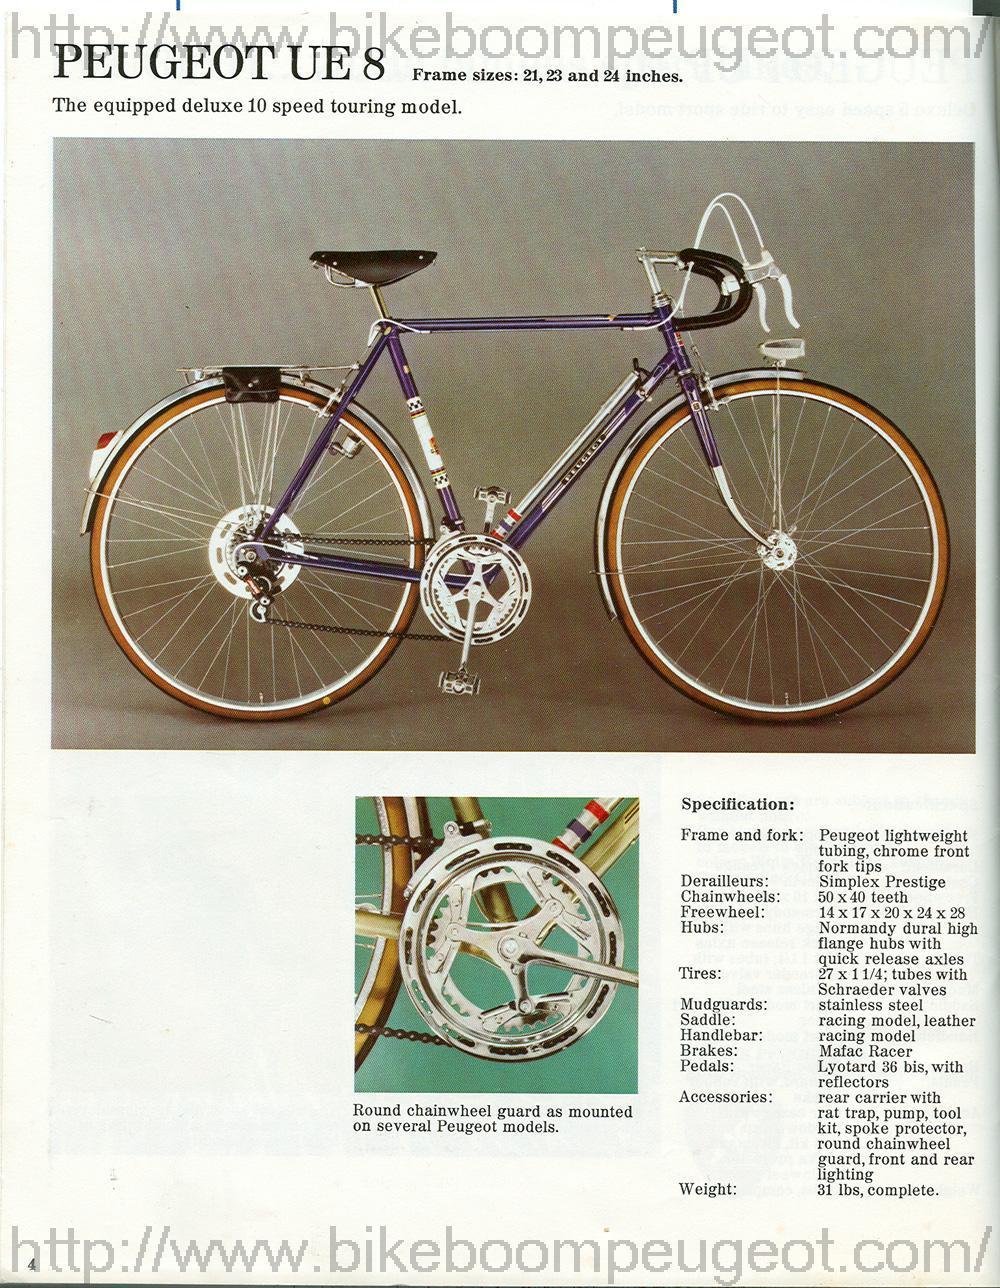 Peugeot serial number - identify bike? - Bike Forums